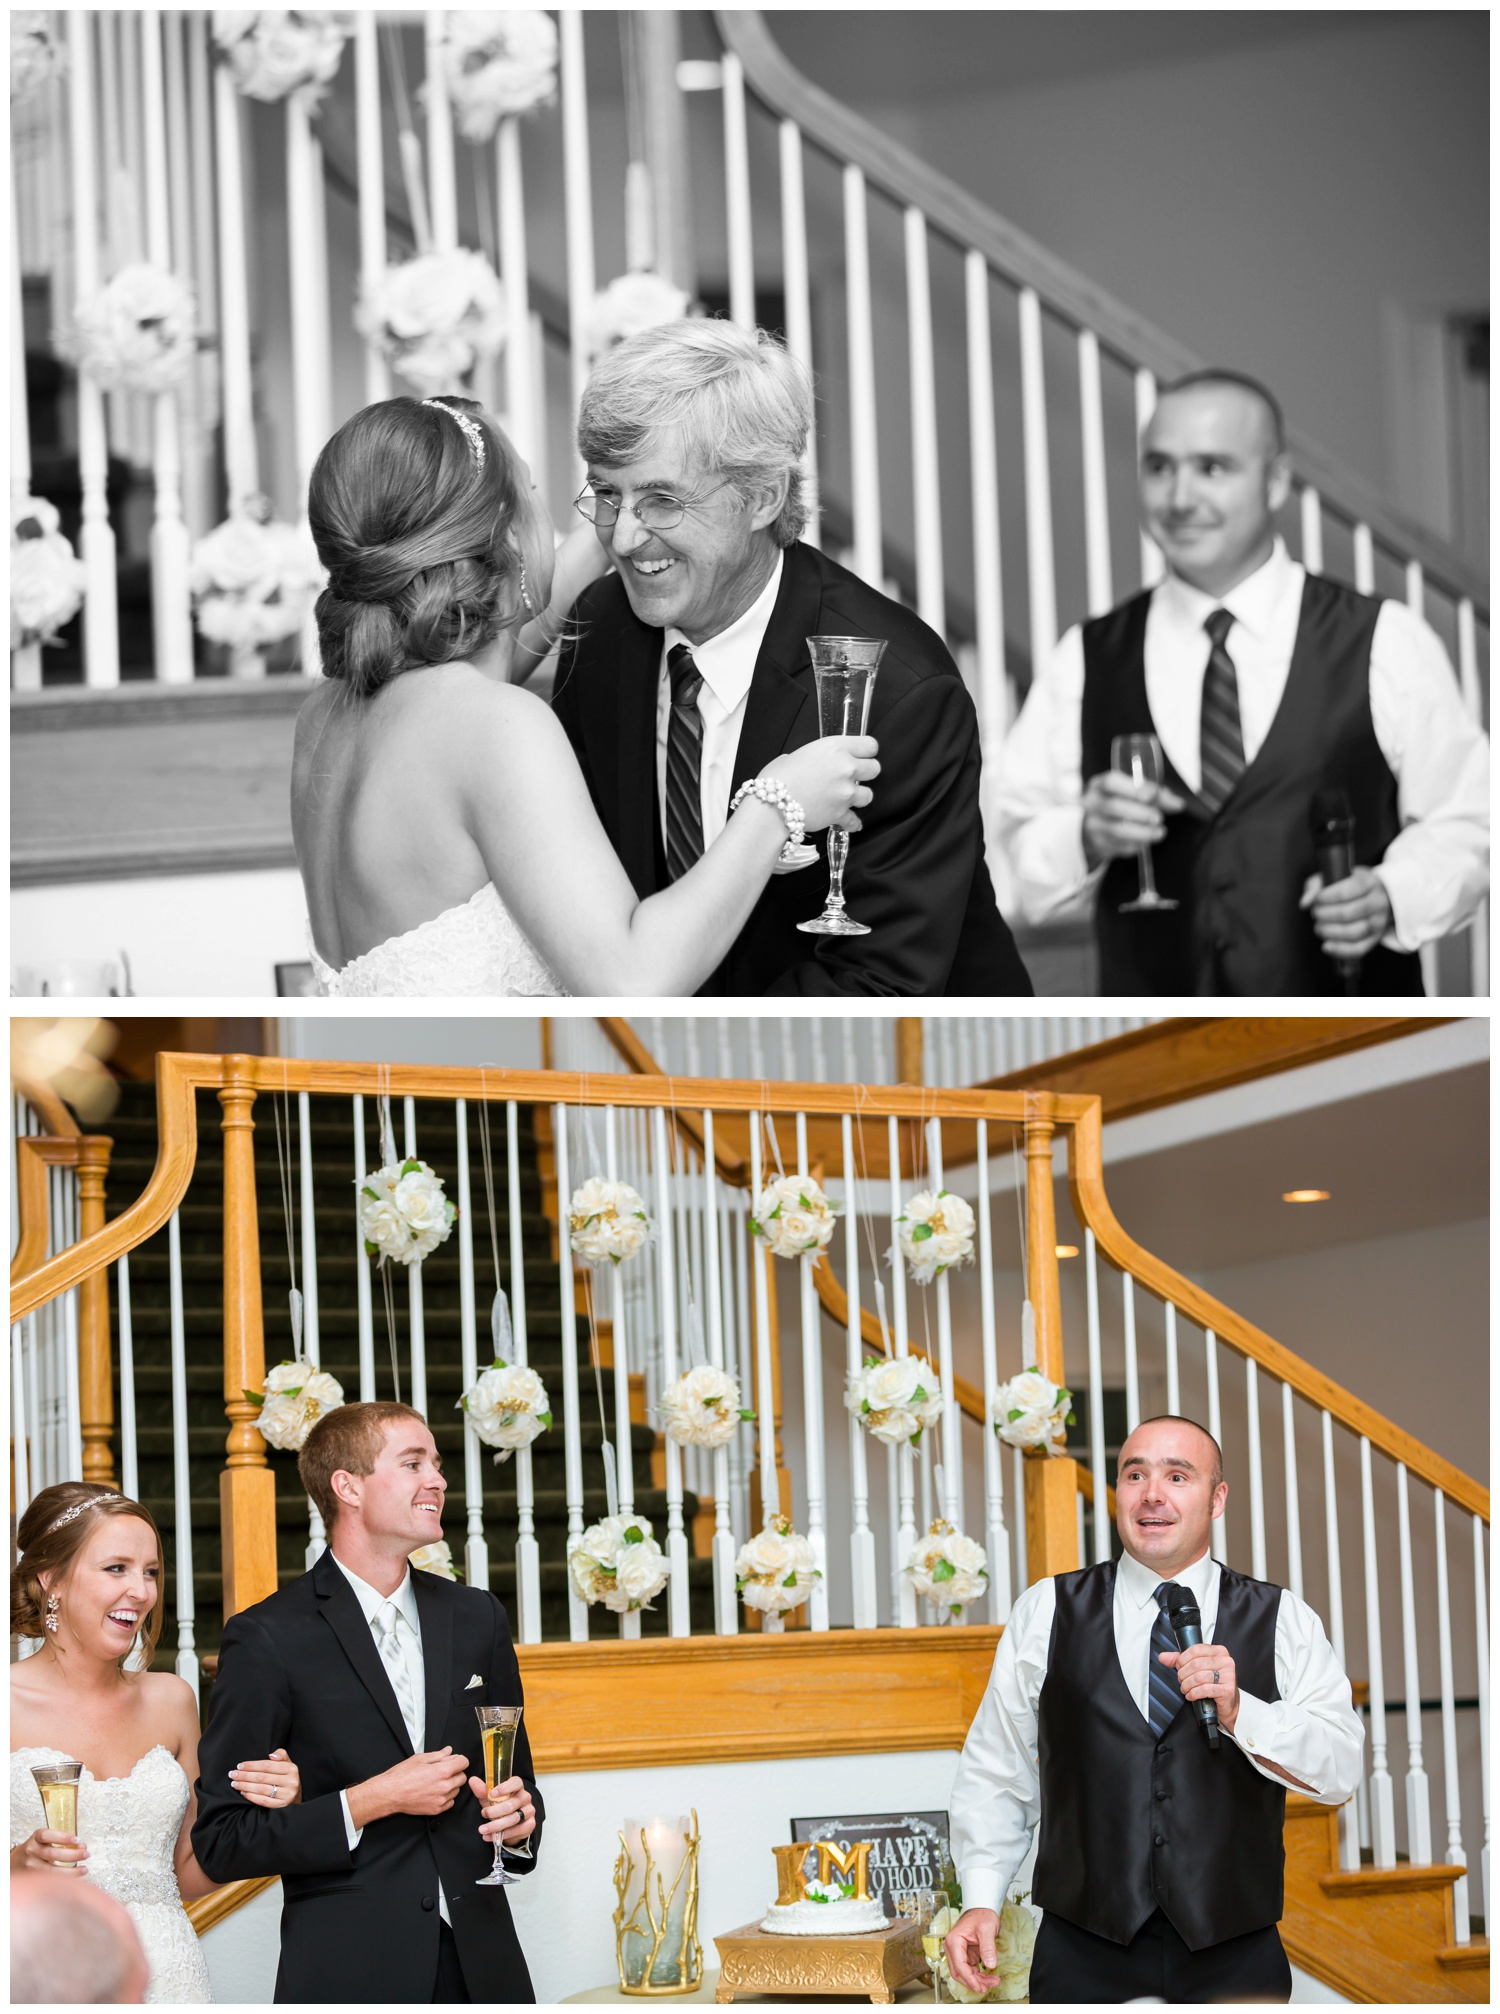 lionscrest manor wedding photography43.jpg